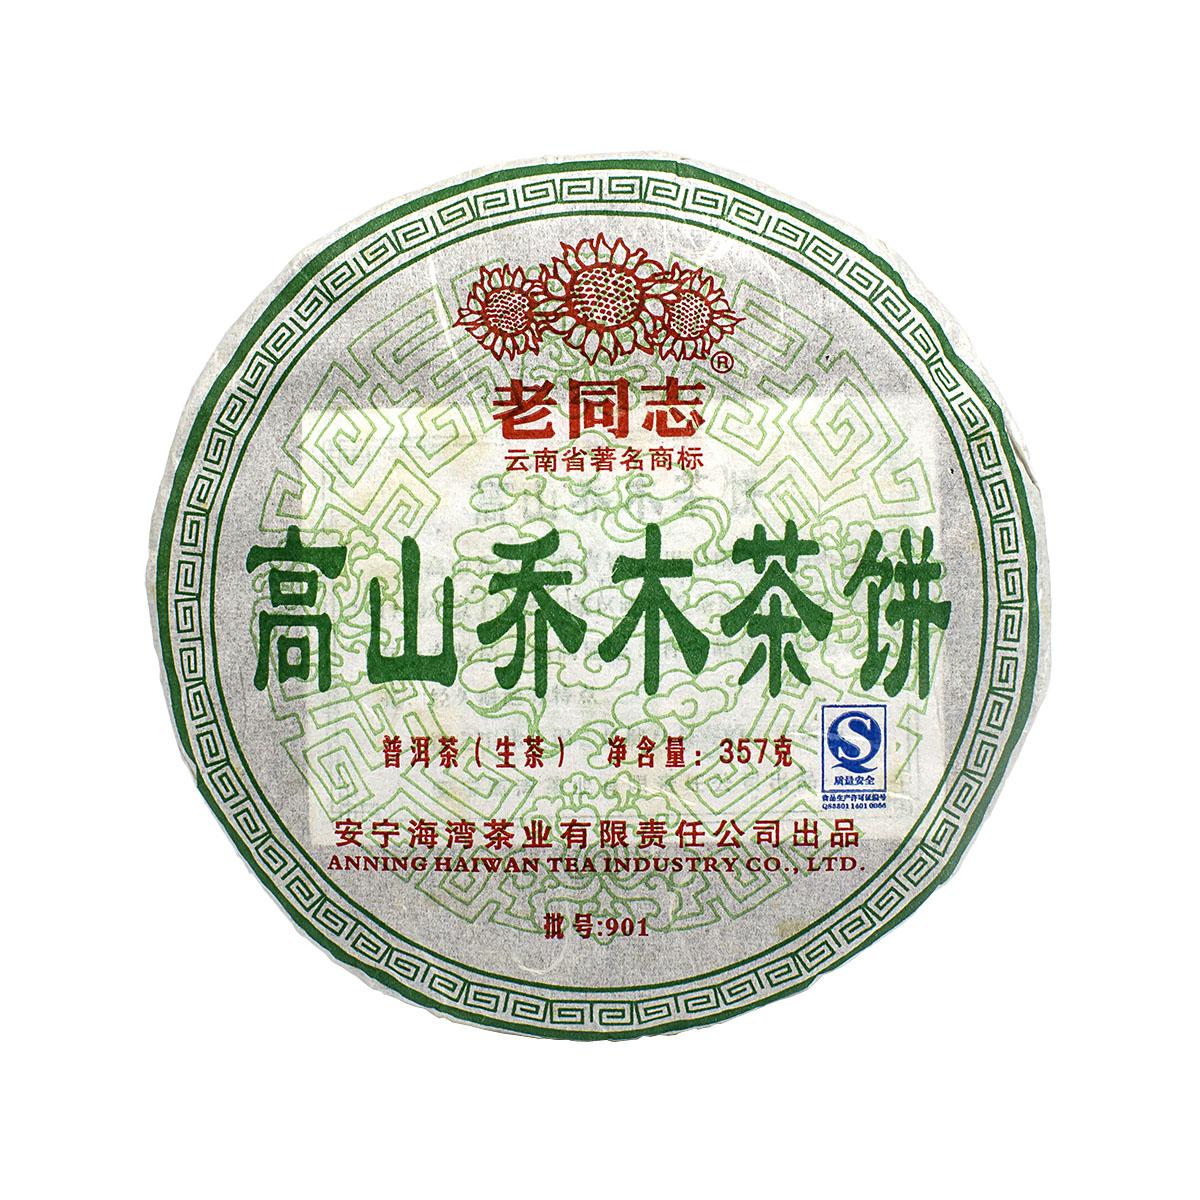 "Купить со скидкой Шен Пуэр Лао Тун Чжи ""Гао Шань Цяо Му"", 2009, блин, 357 г"